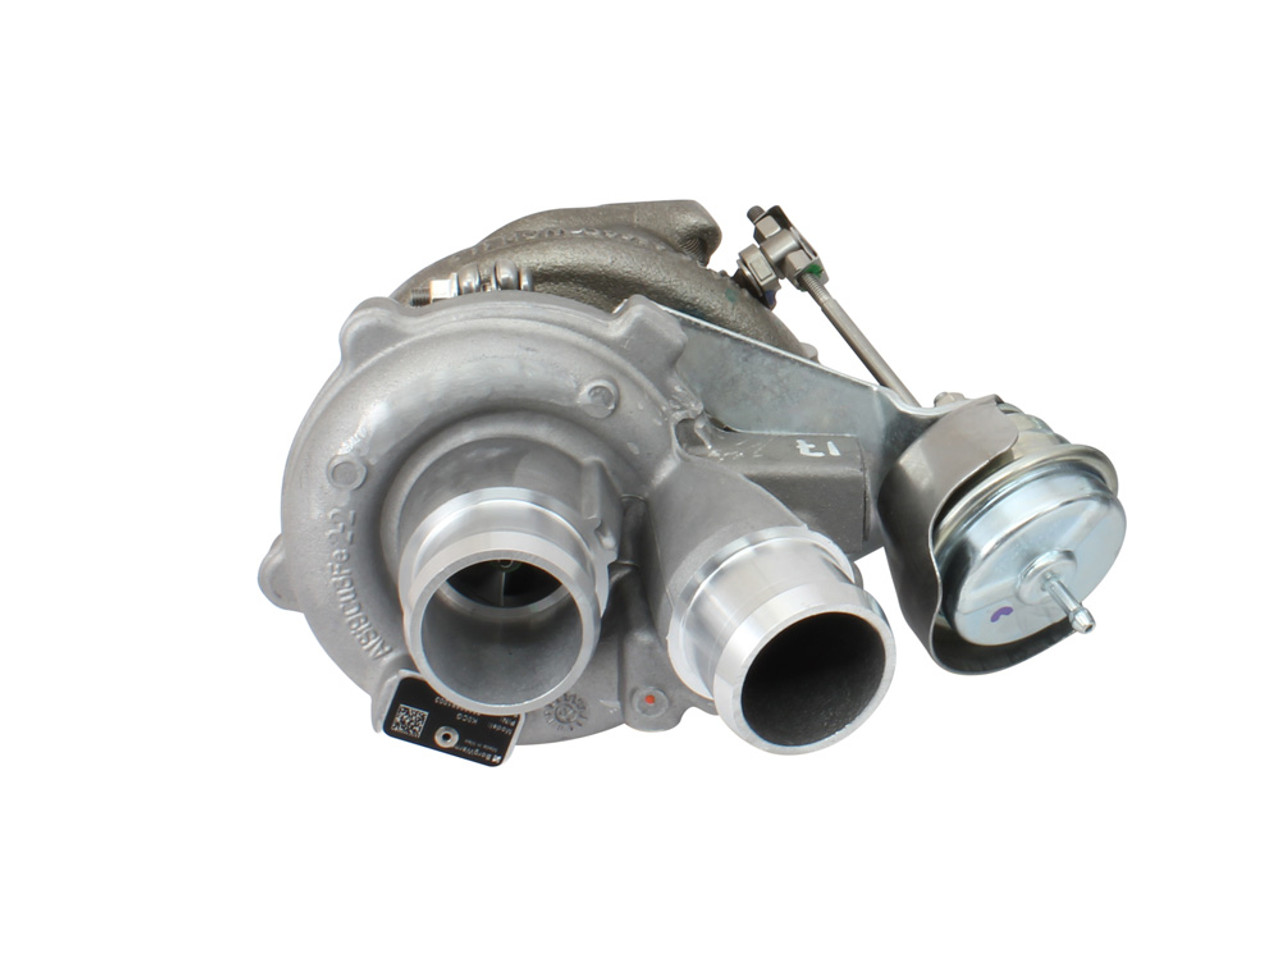 Borg Warner 3.5 Ecoboost F150 Turbo Upgrade 53039881003 2013-2016 Right Side